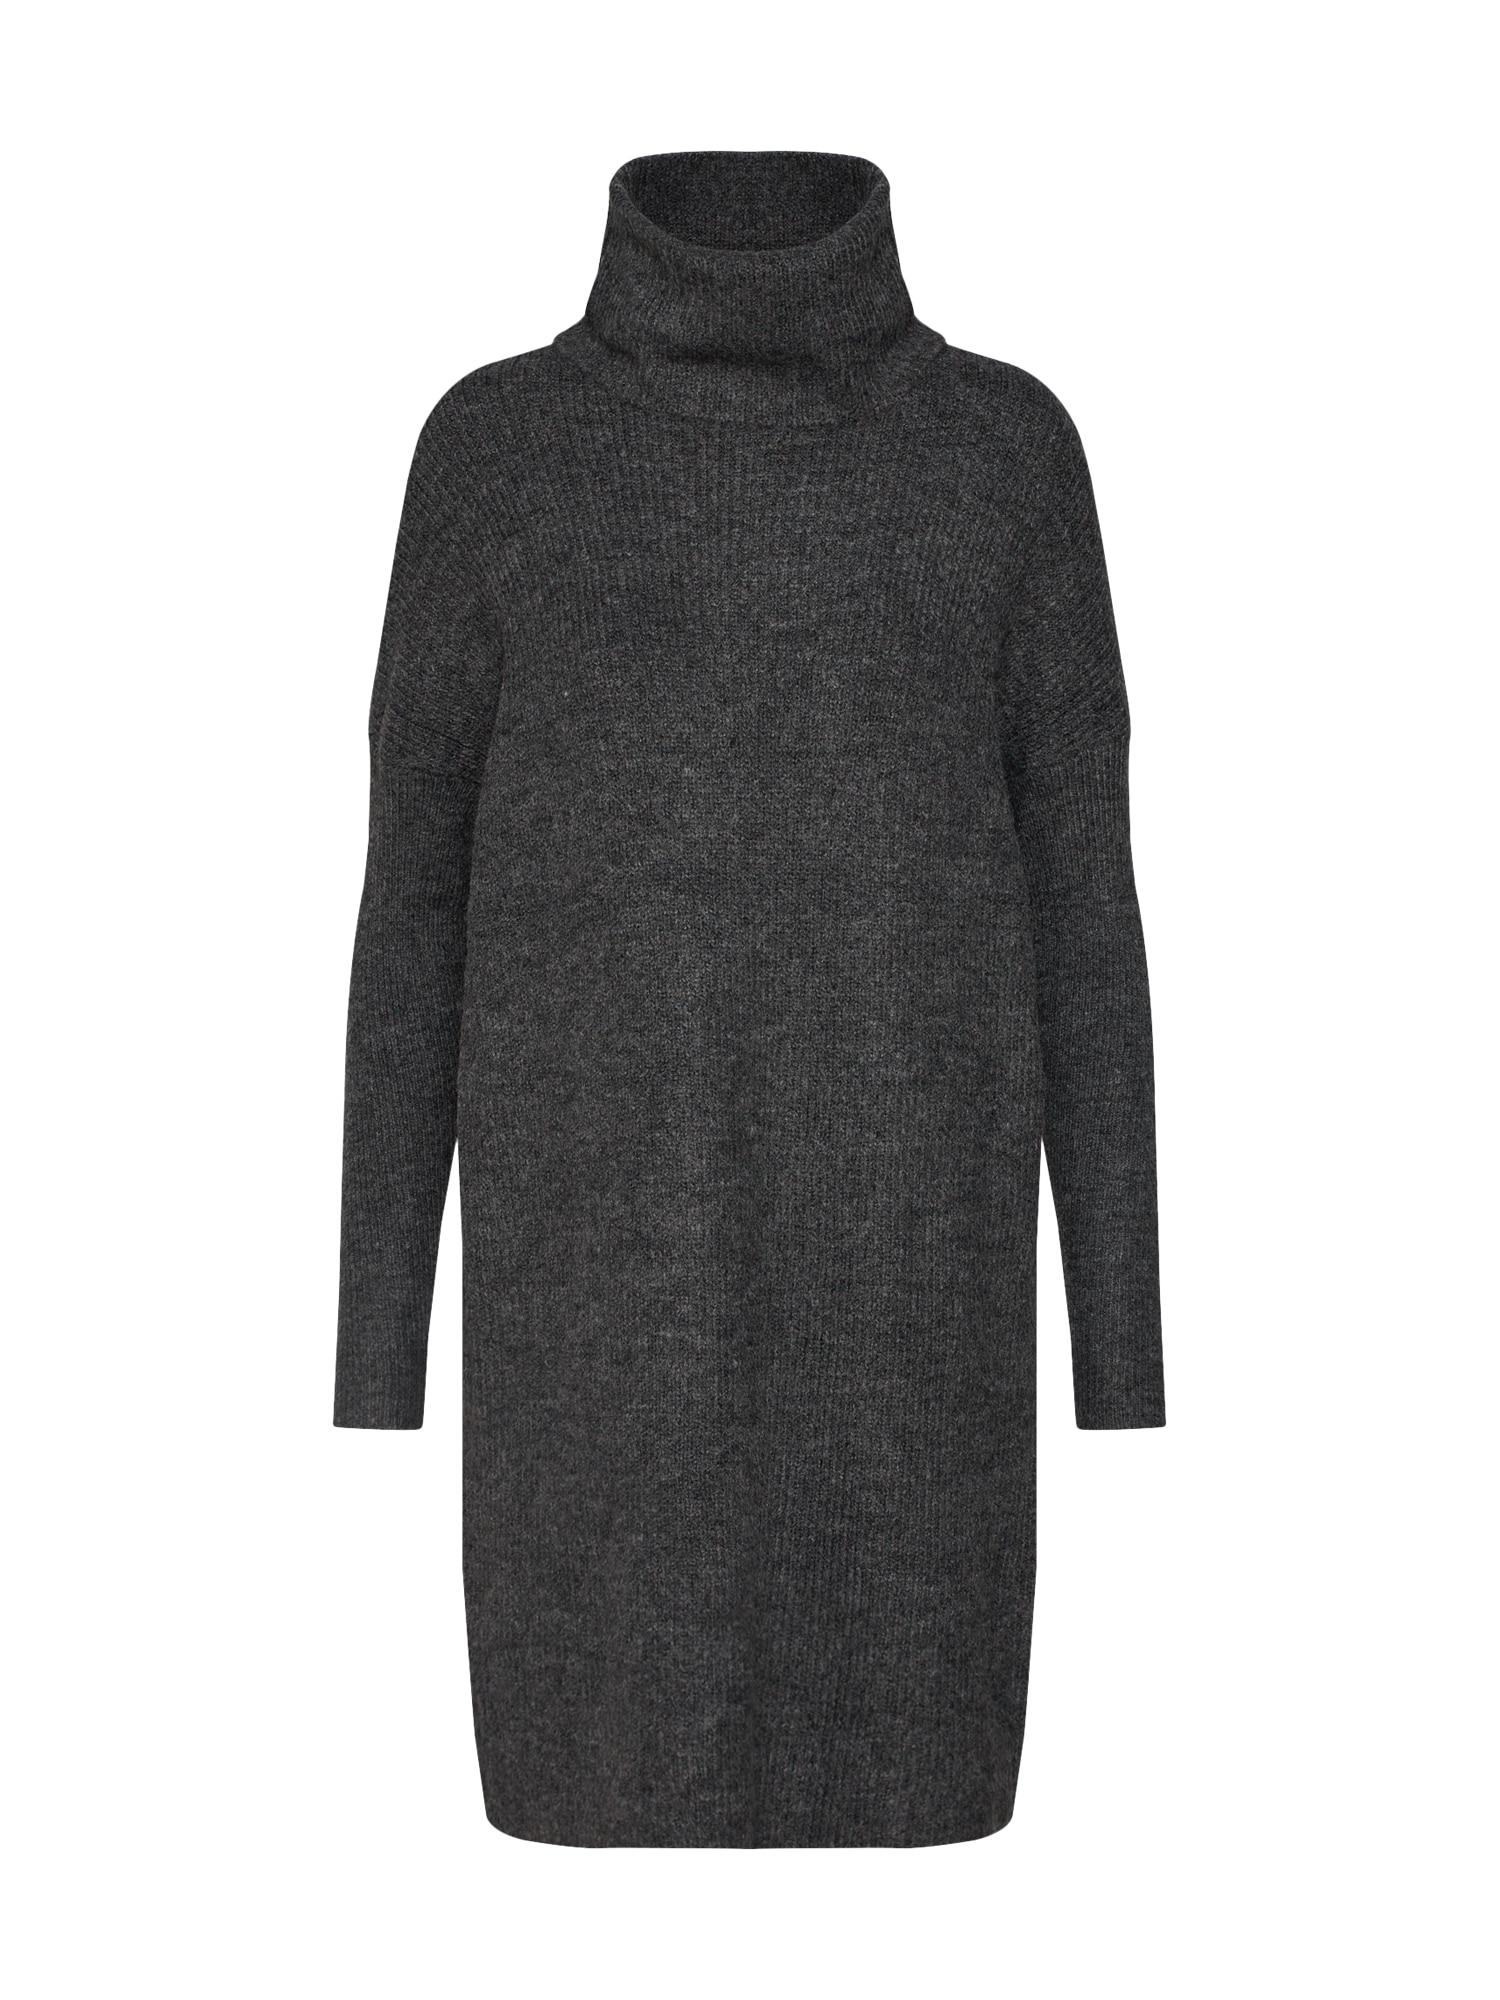 ONLY Megzta suknelė tamsiai pilka